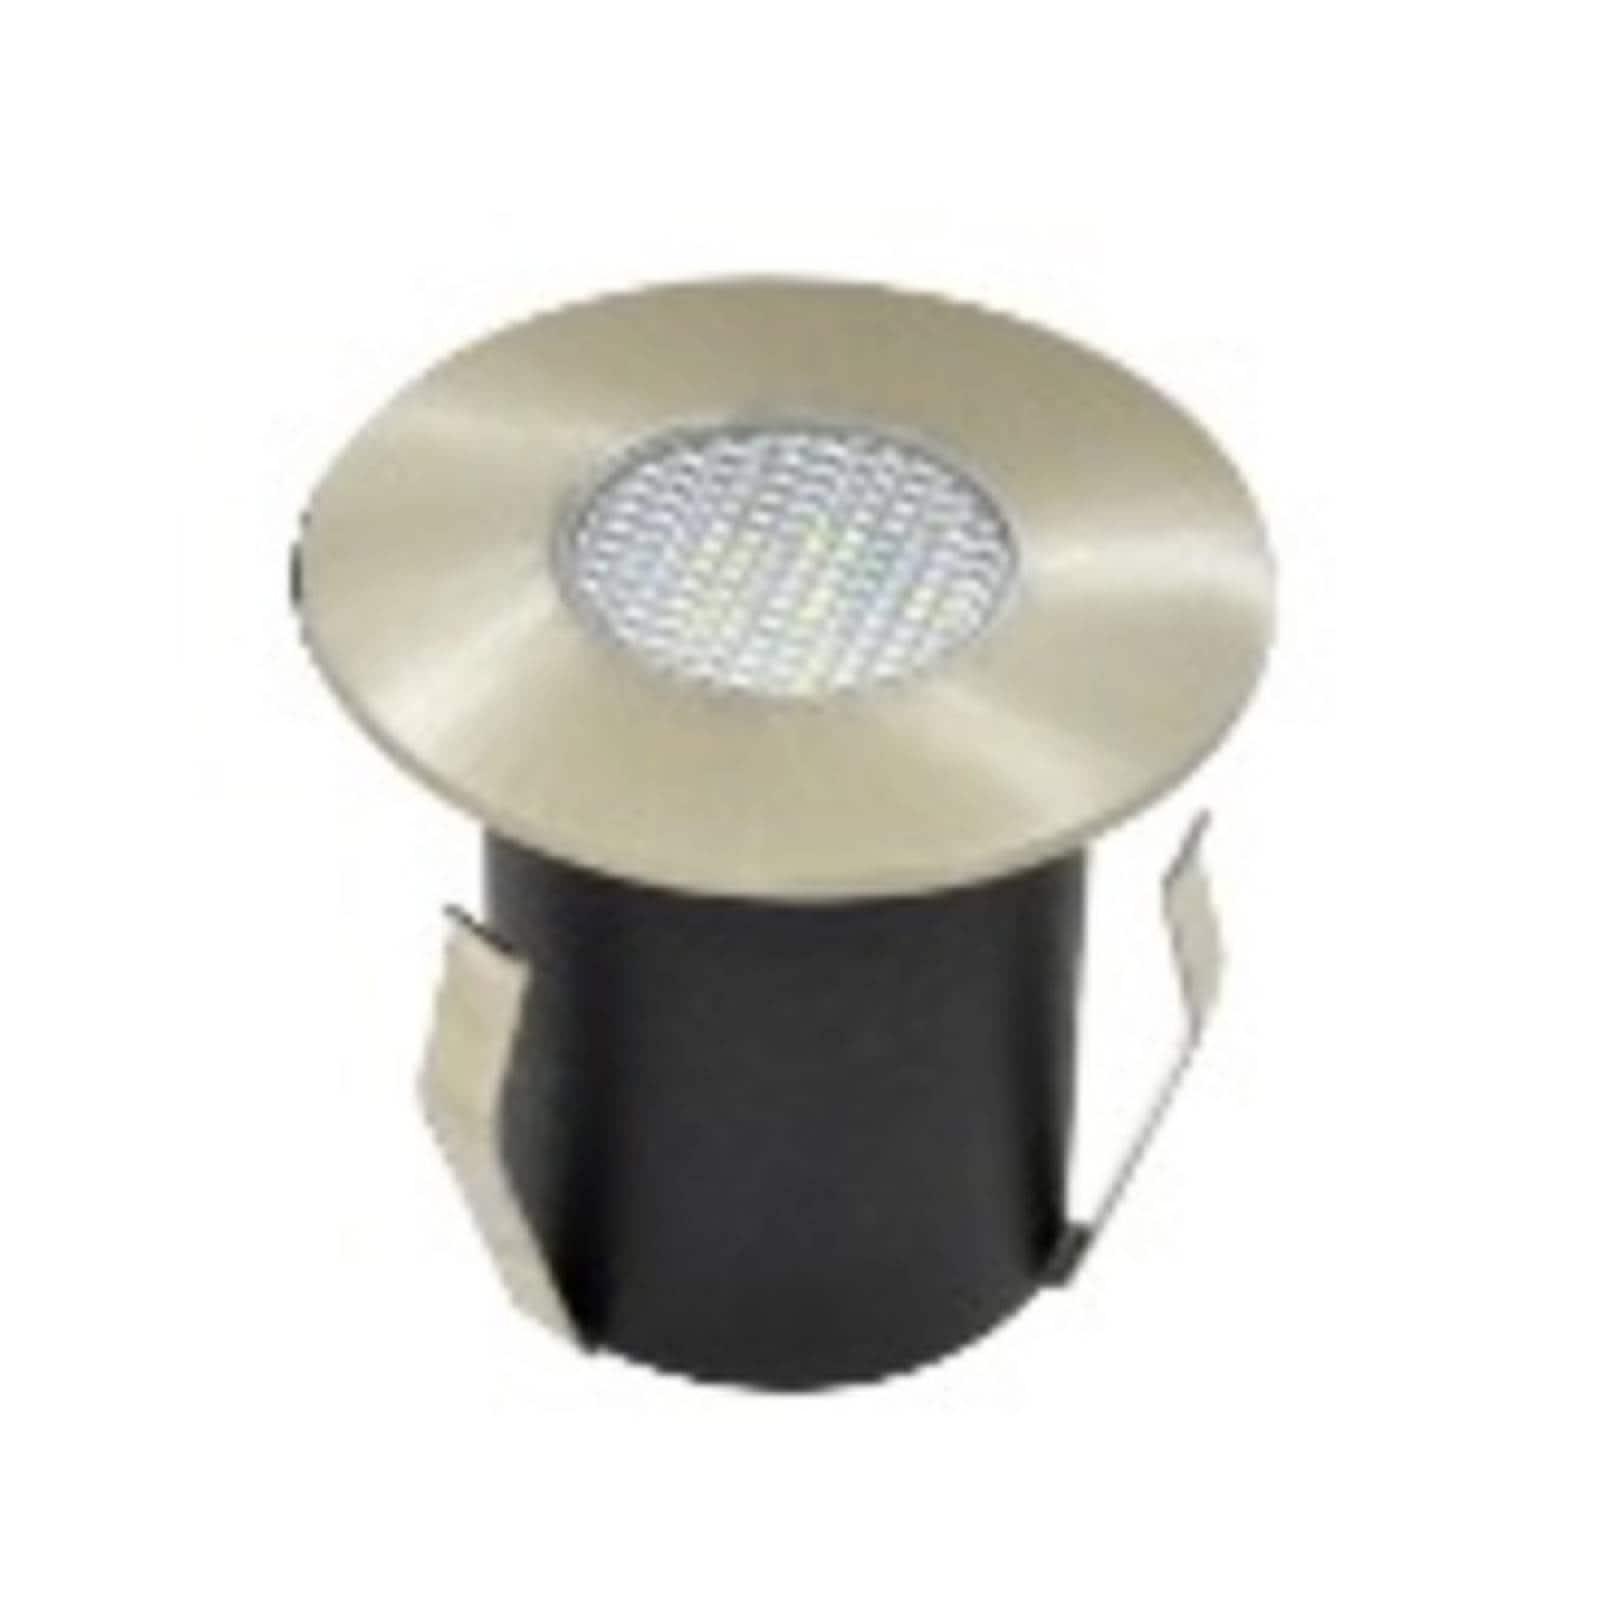 Lámpara Luminario Led Empotrado Piso Ad-5713 1W RGB Adir